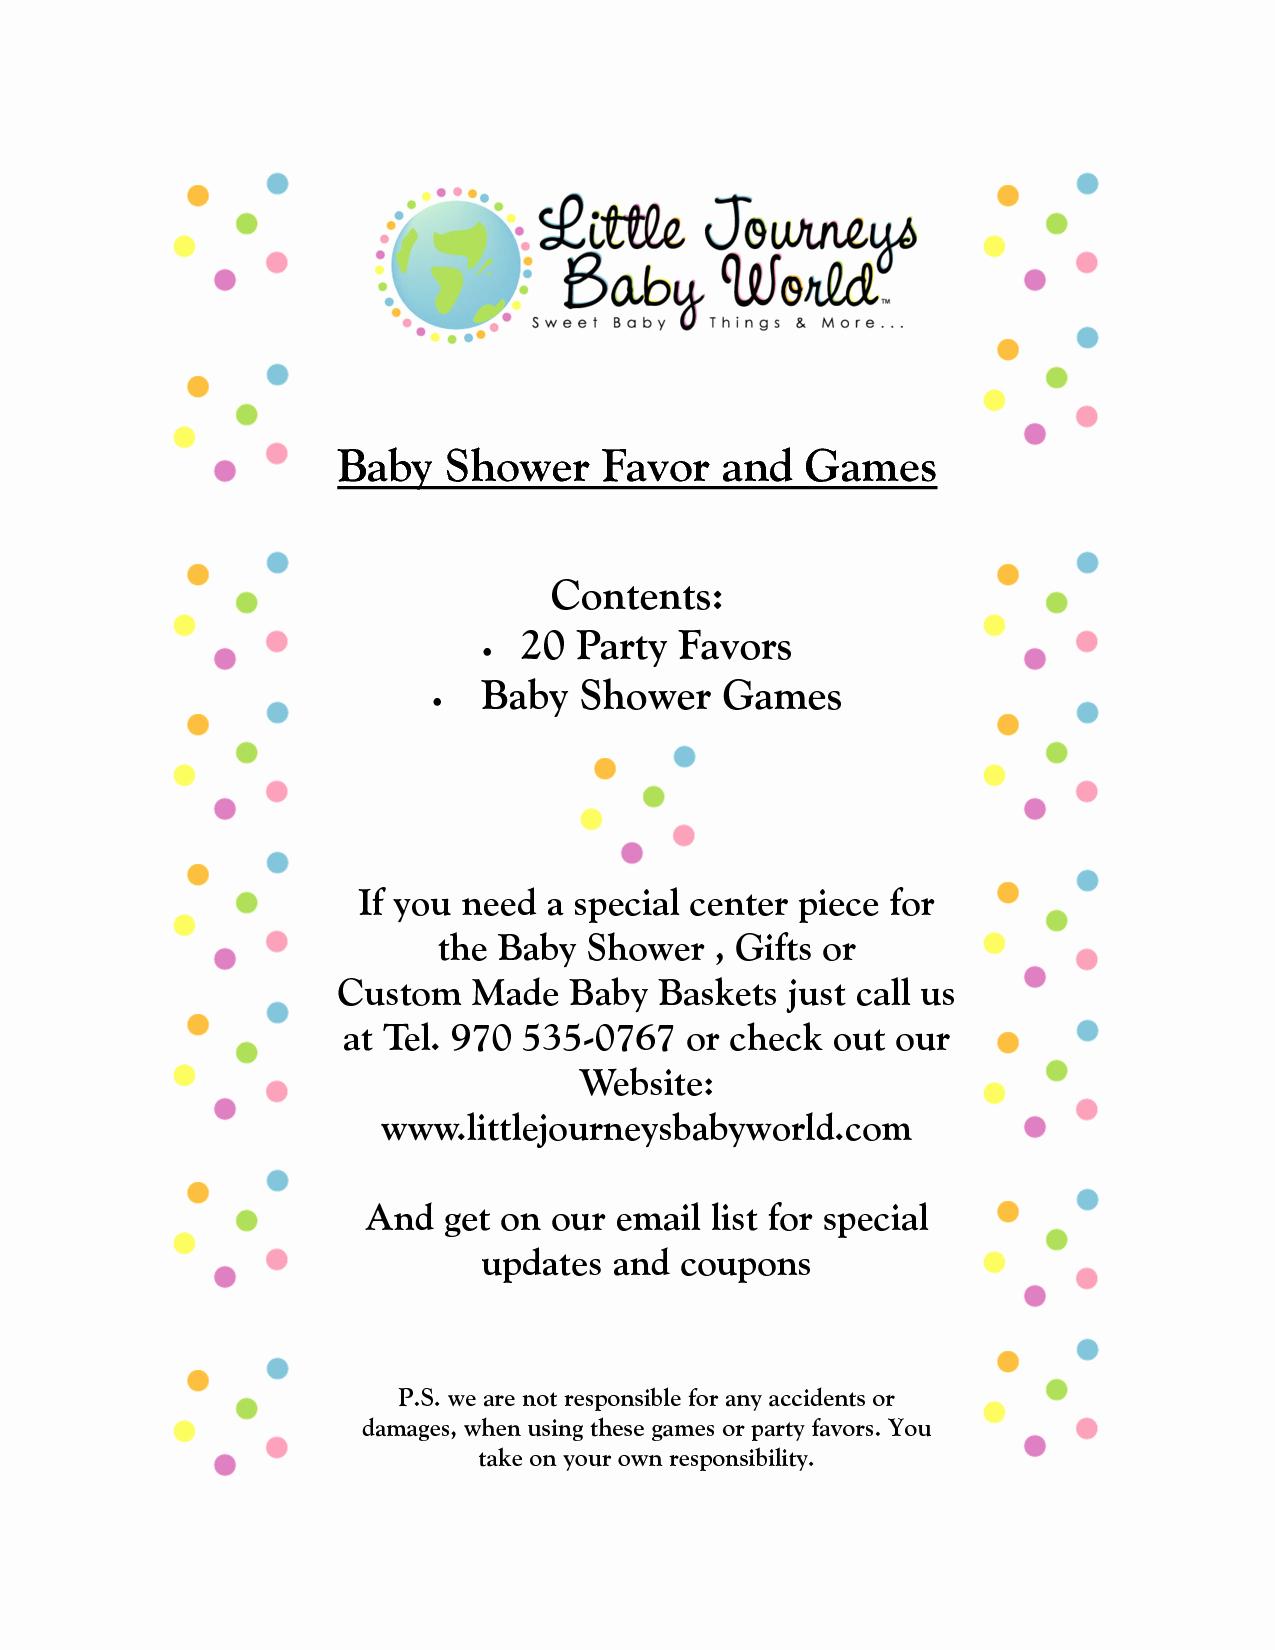 Baby Shower Program Template Luxury Baby Shower Agenda Template Portablegasgrillweber